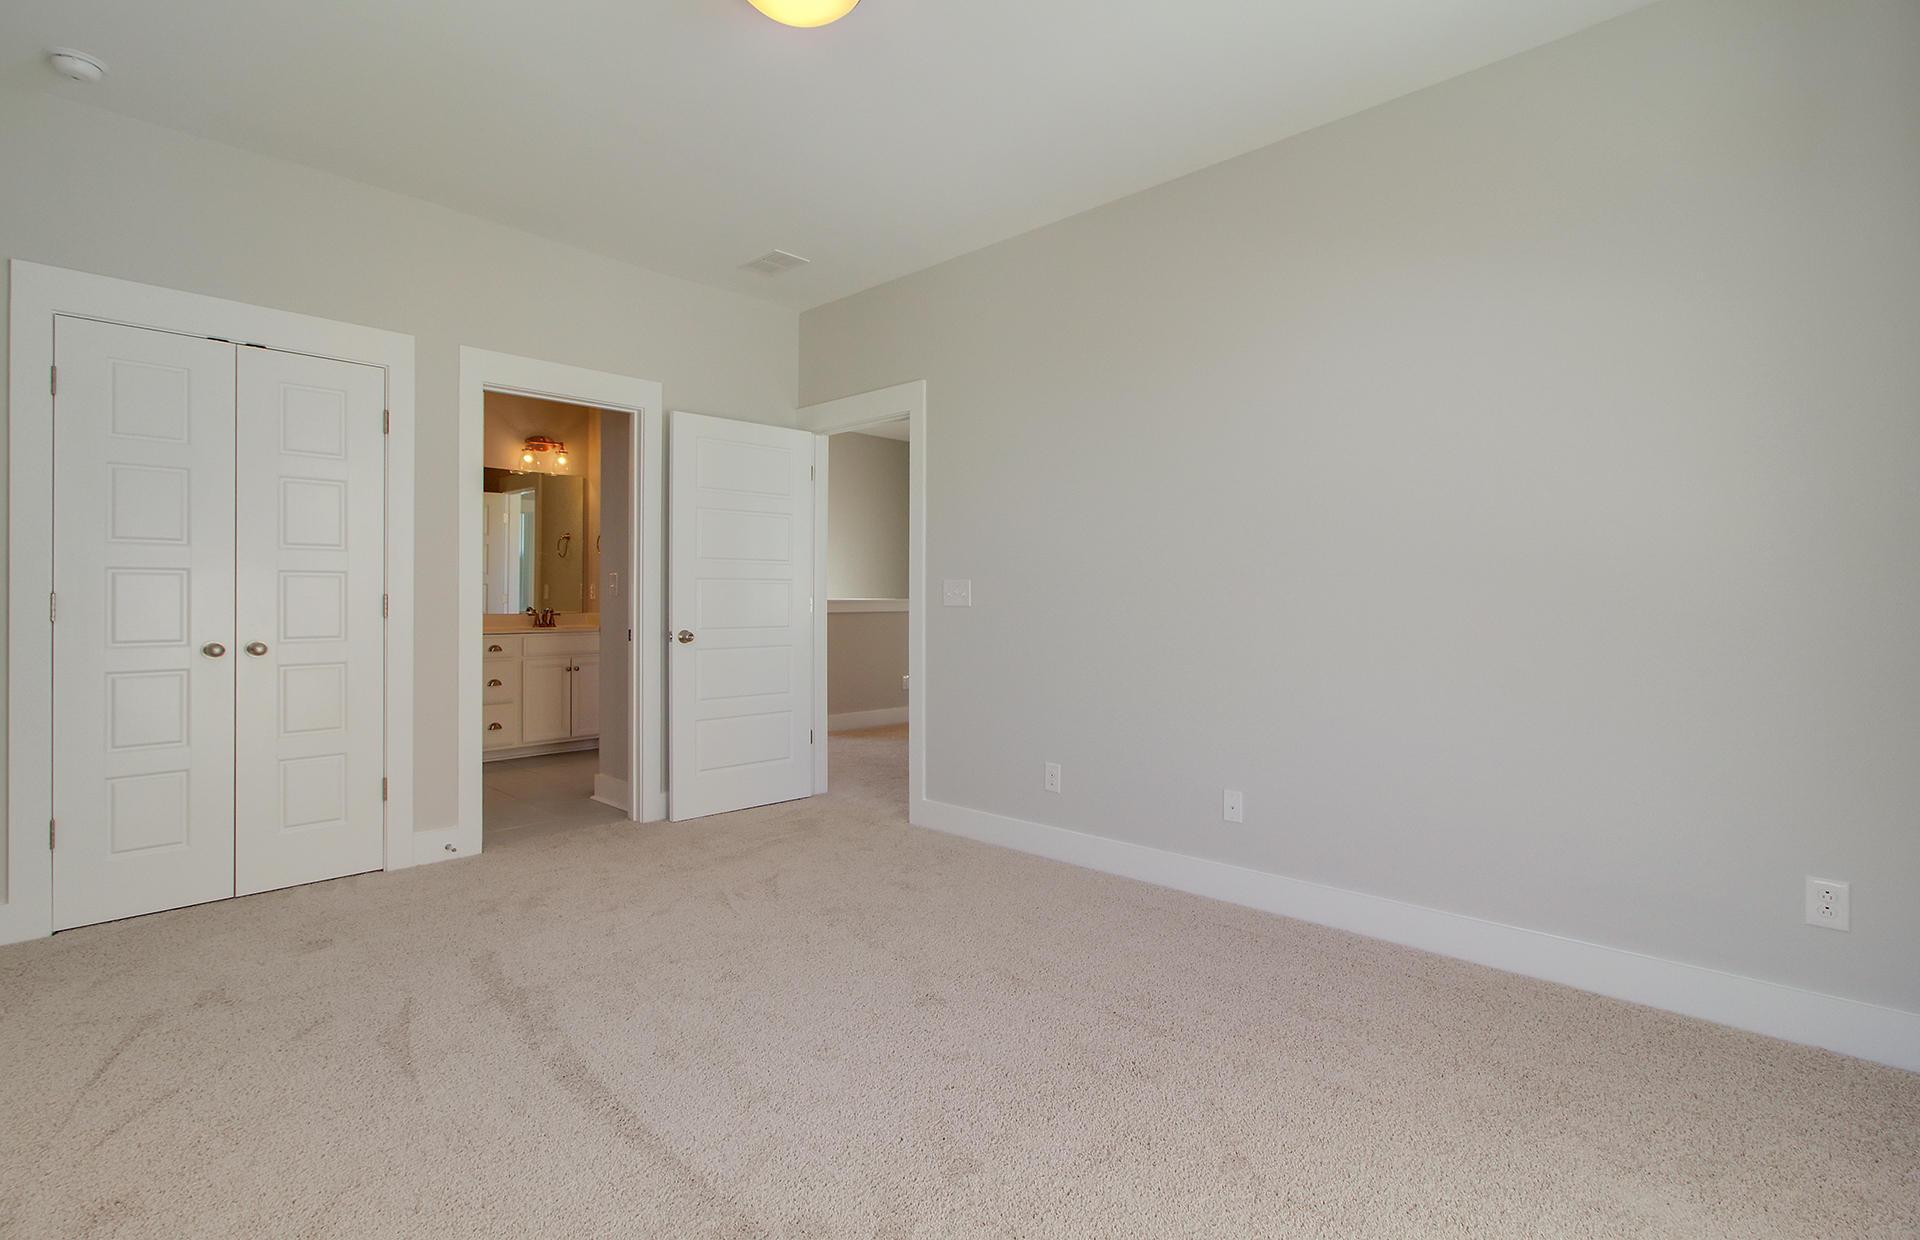 Carolina Park Homes For Sale - 3583 Backshore, Mount Pleasant, SC - 0